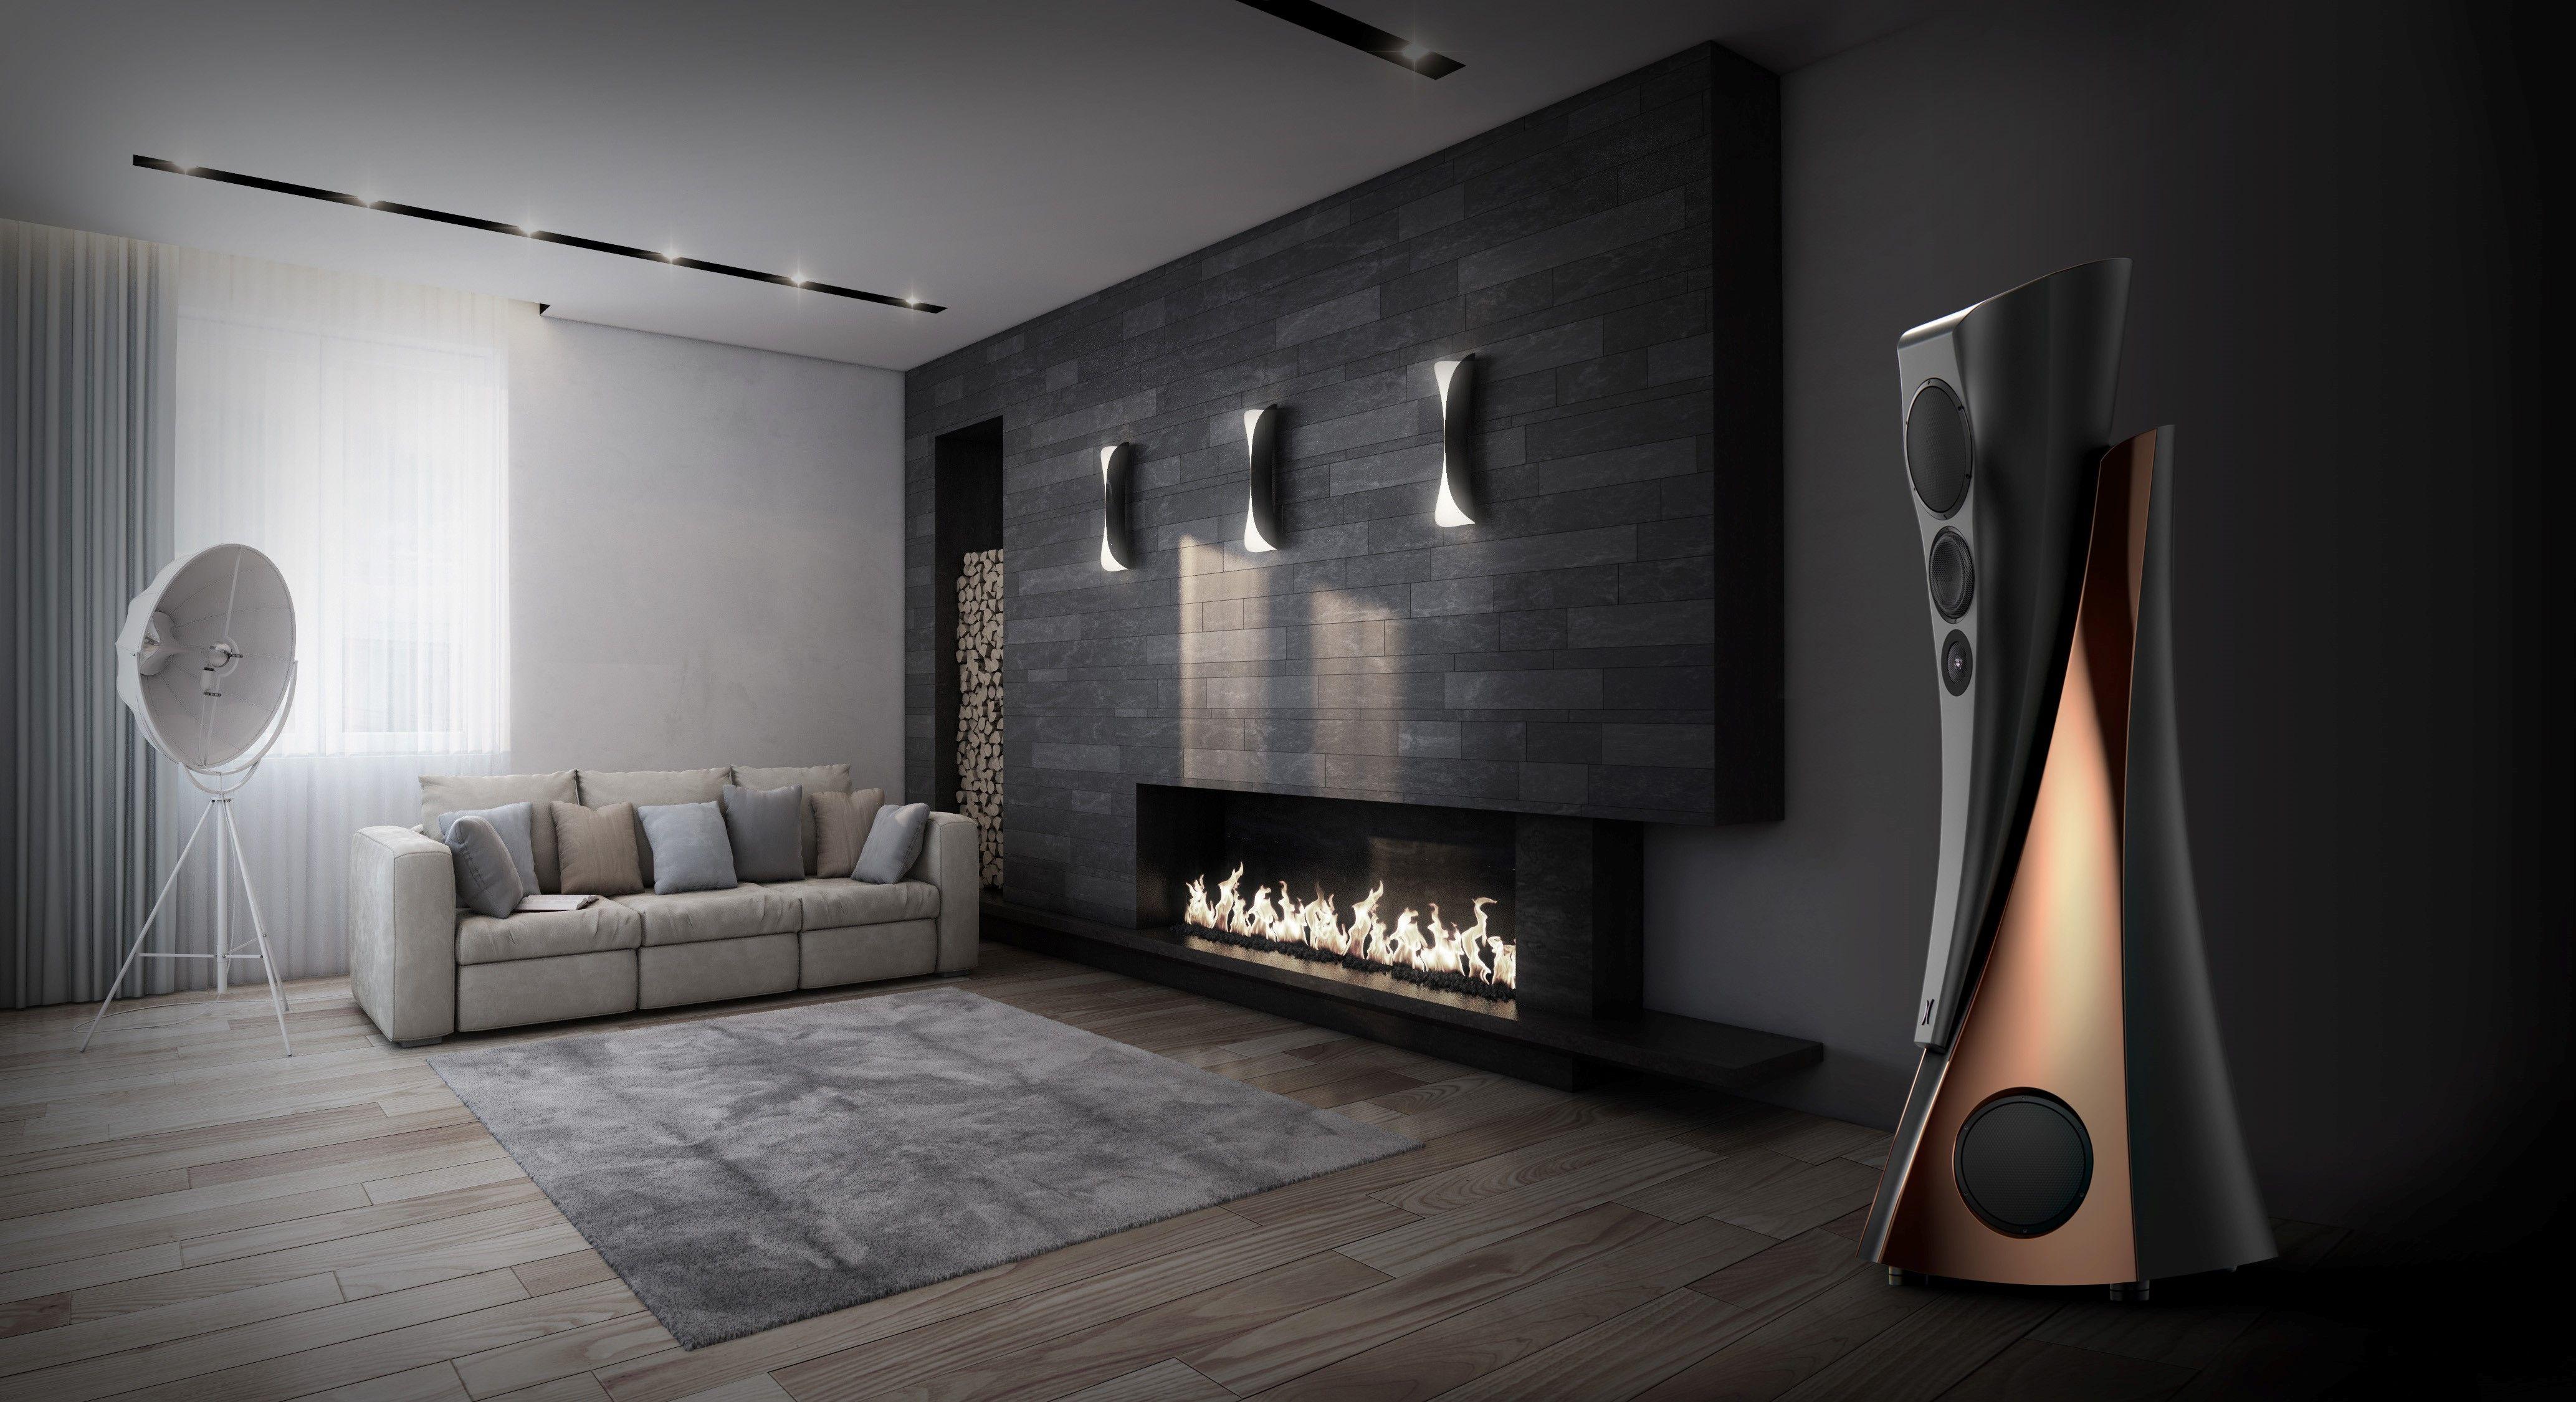 Estelon Extreme Loudspeakers Estelon Extreme Xe Loudspeakers Speaker Bestspeakers Luxury Interior Ho Luxury Interior Design Luxury Interior Audio Room #sound #system #for #living #room